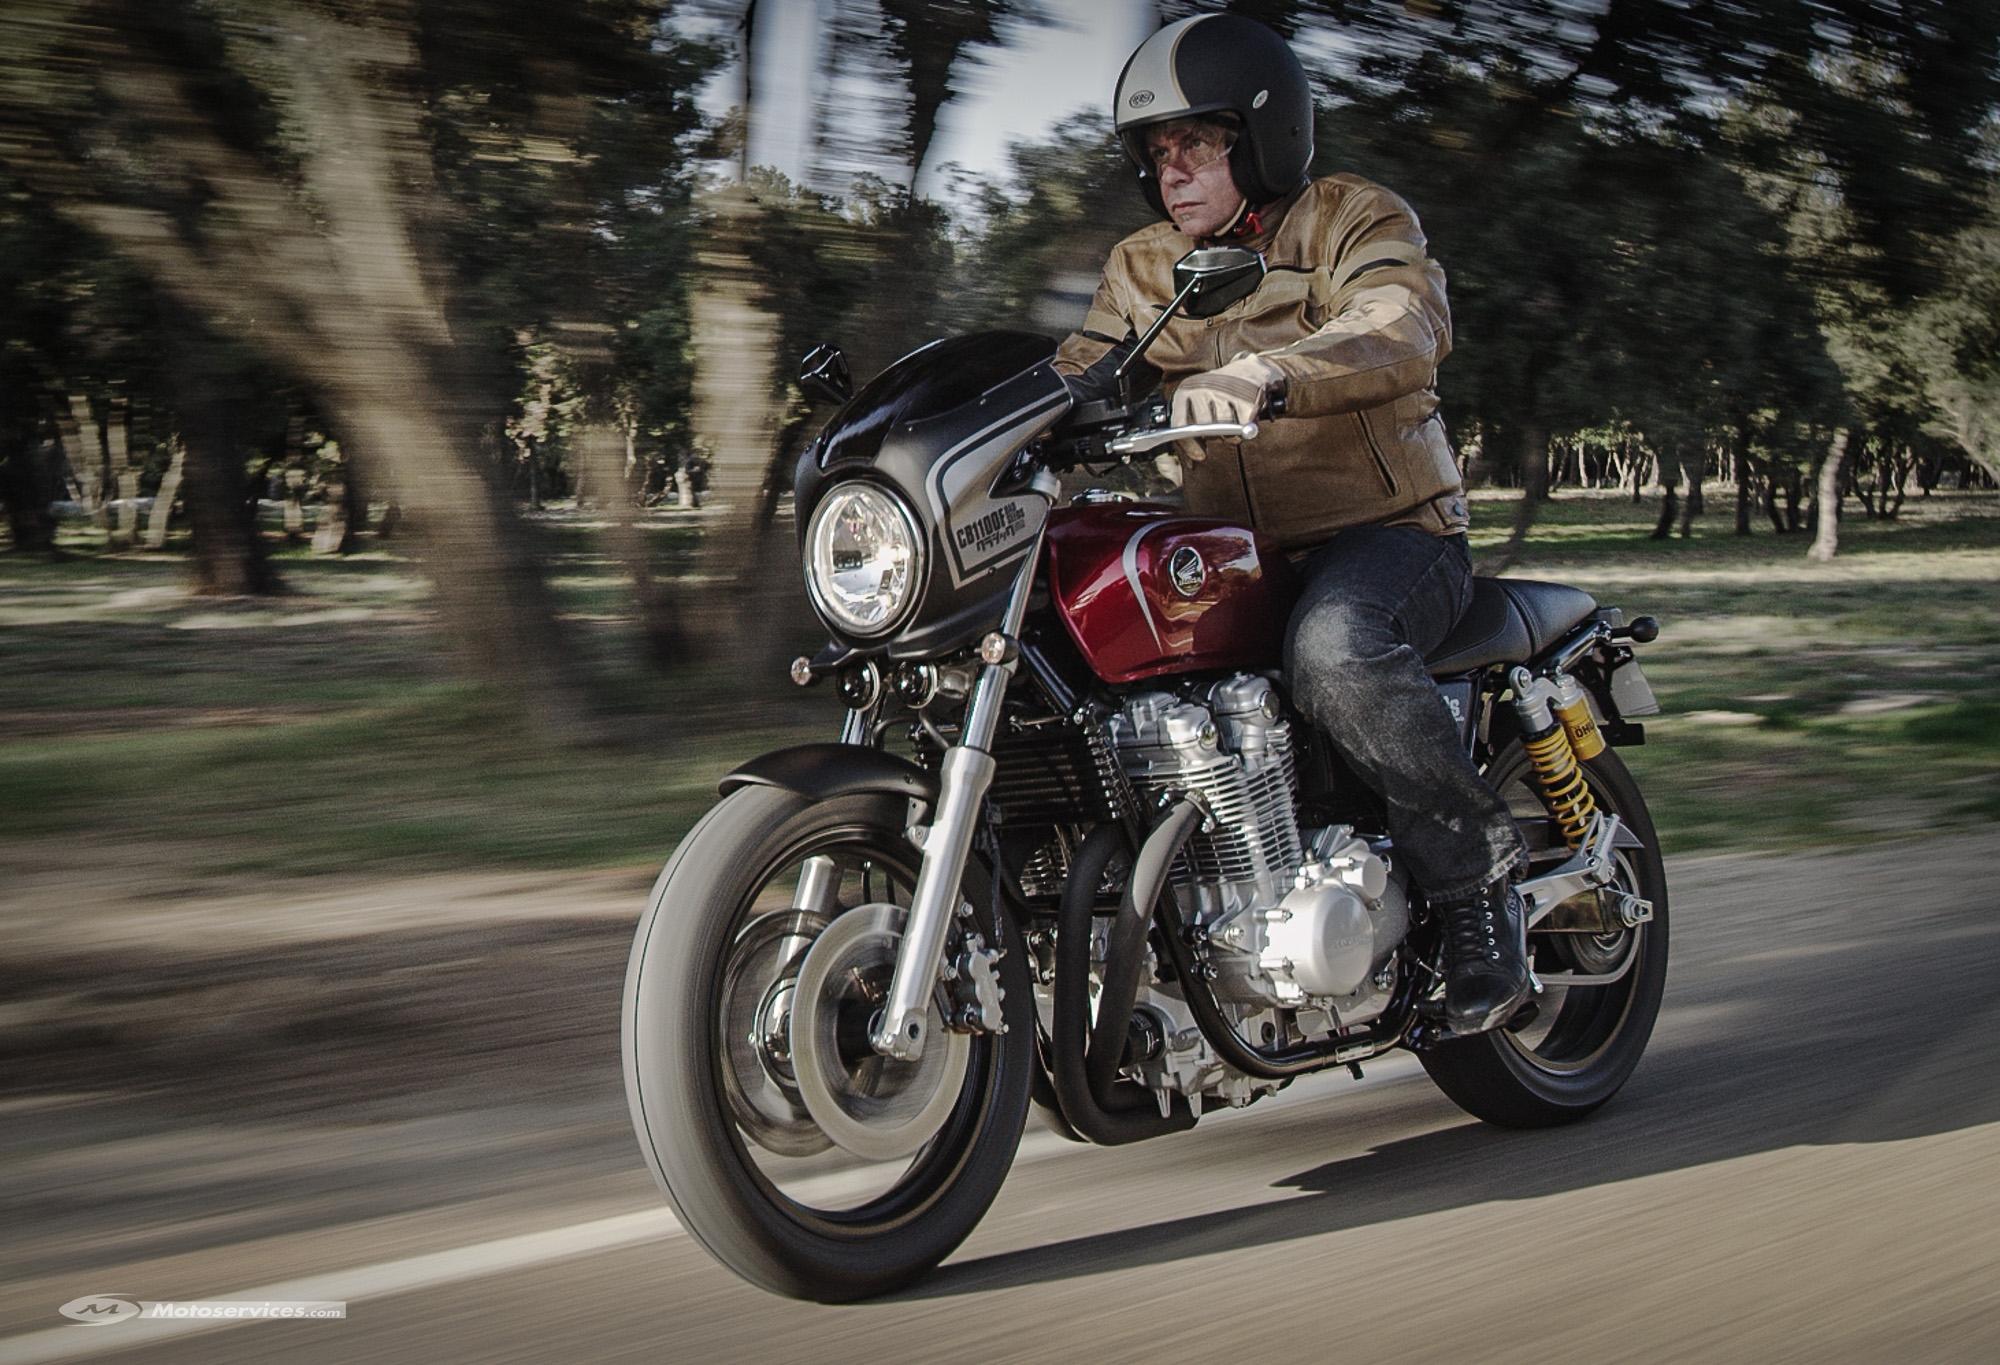 Honda CB1100 Bad Seeds Limited Edition - autoevolution